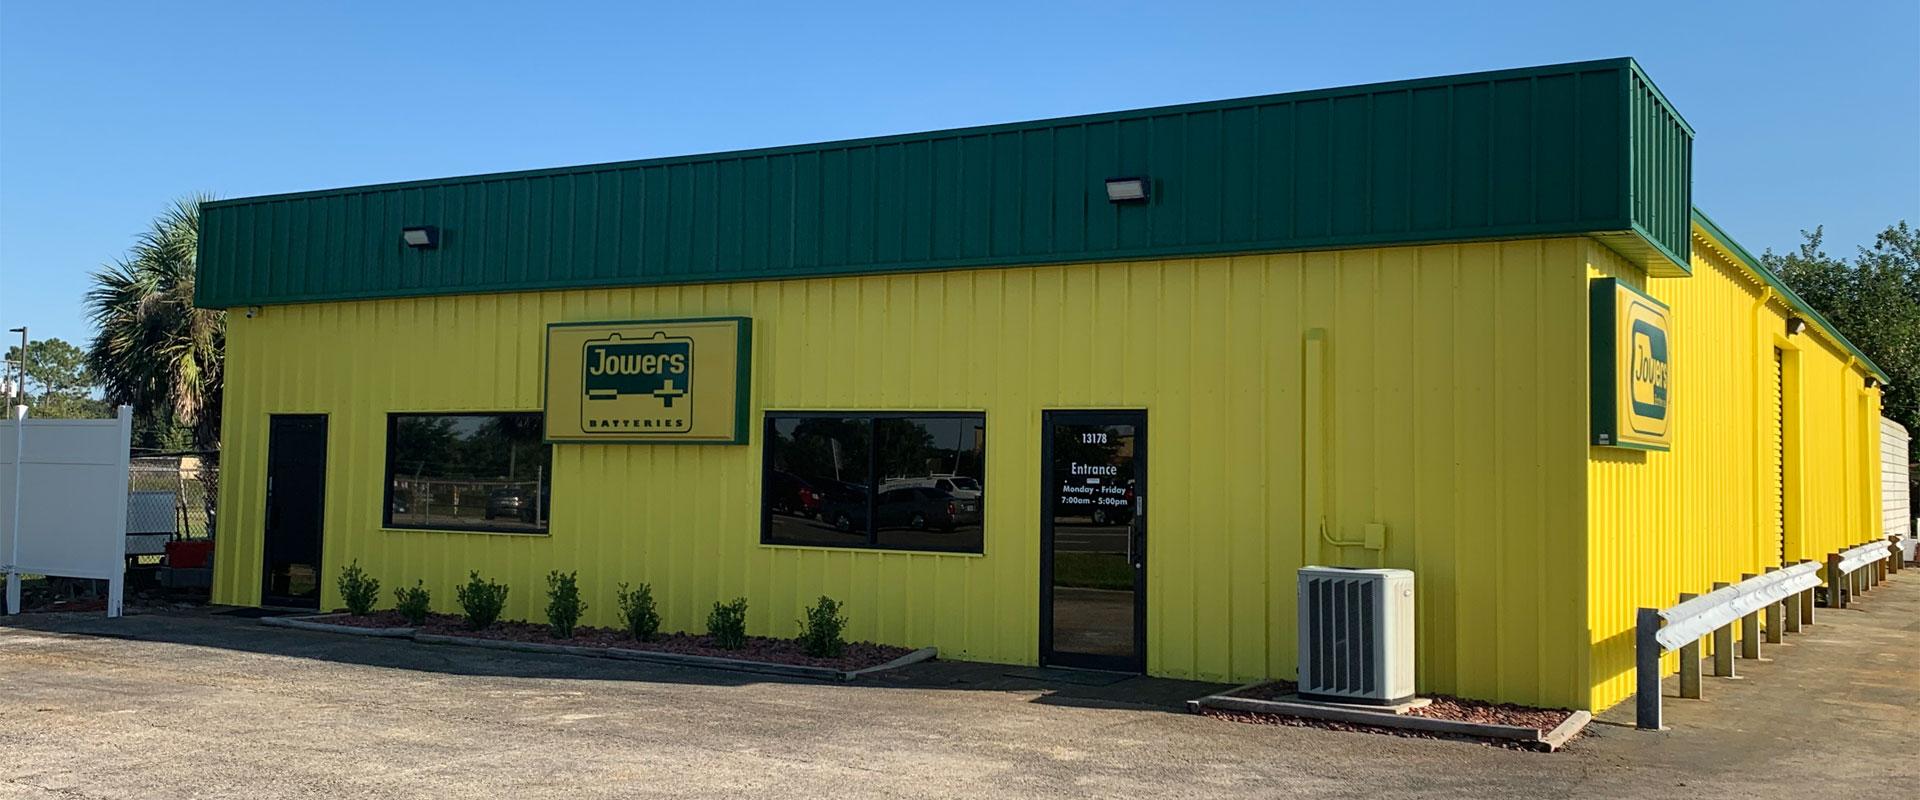 Jowers batteries building in Winter Garden, FL